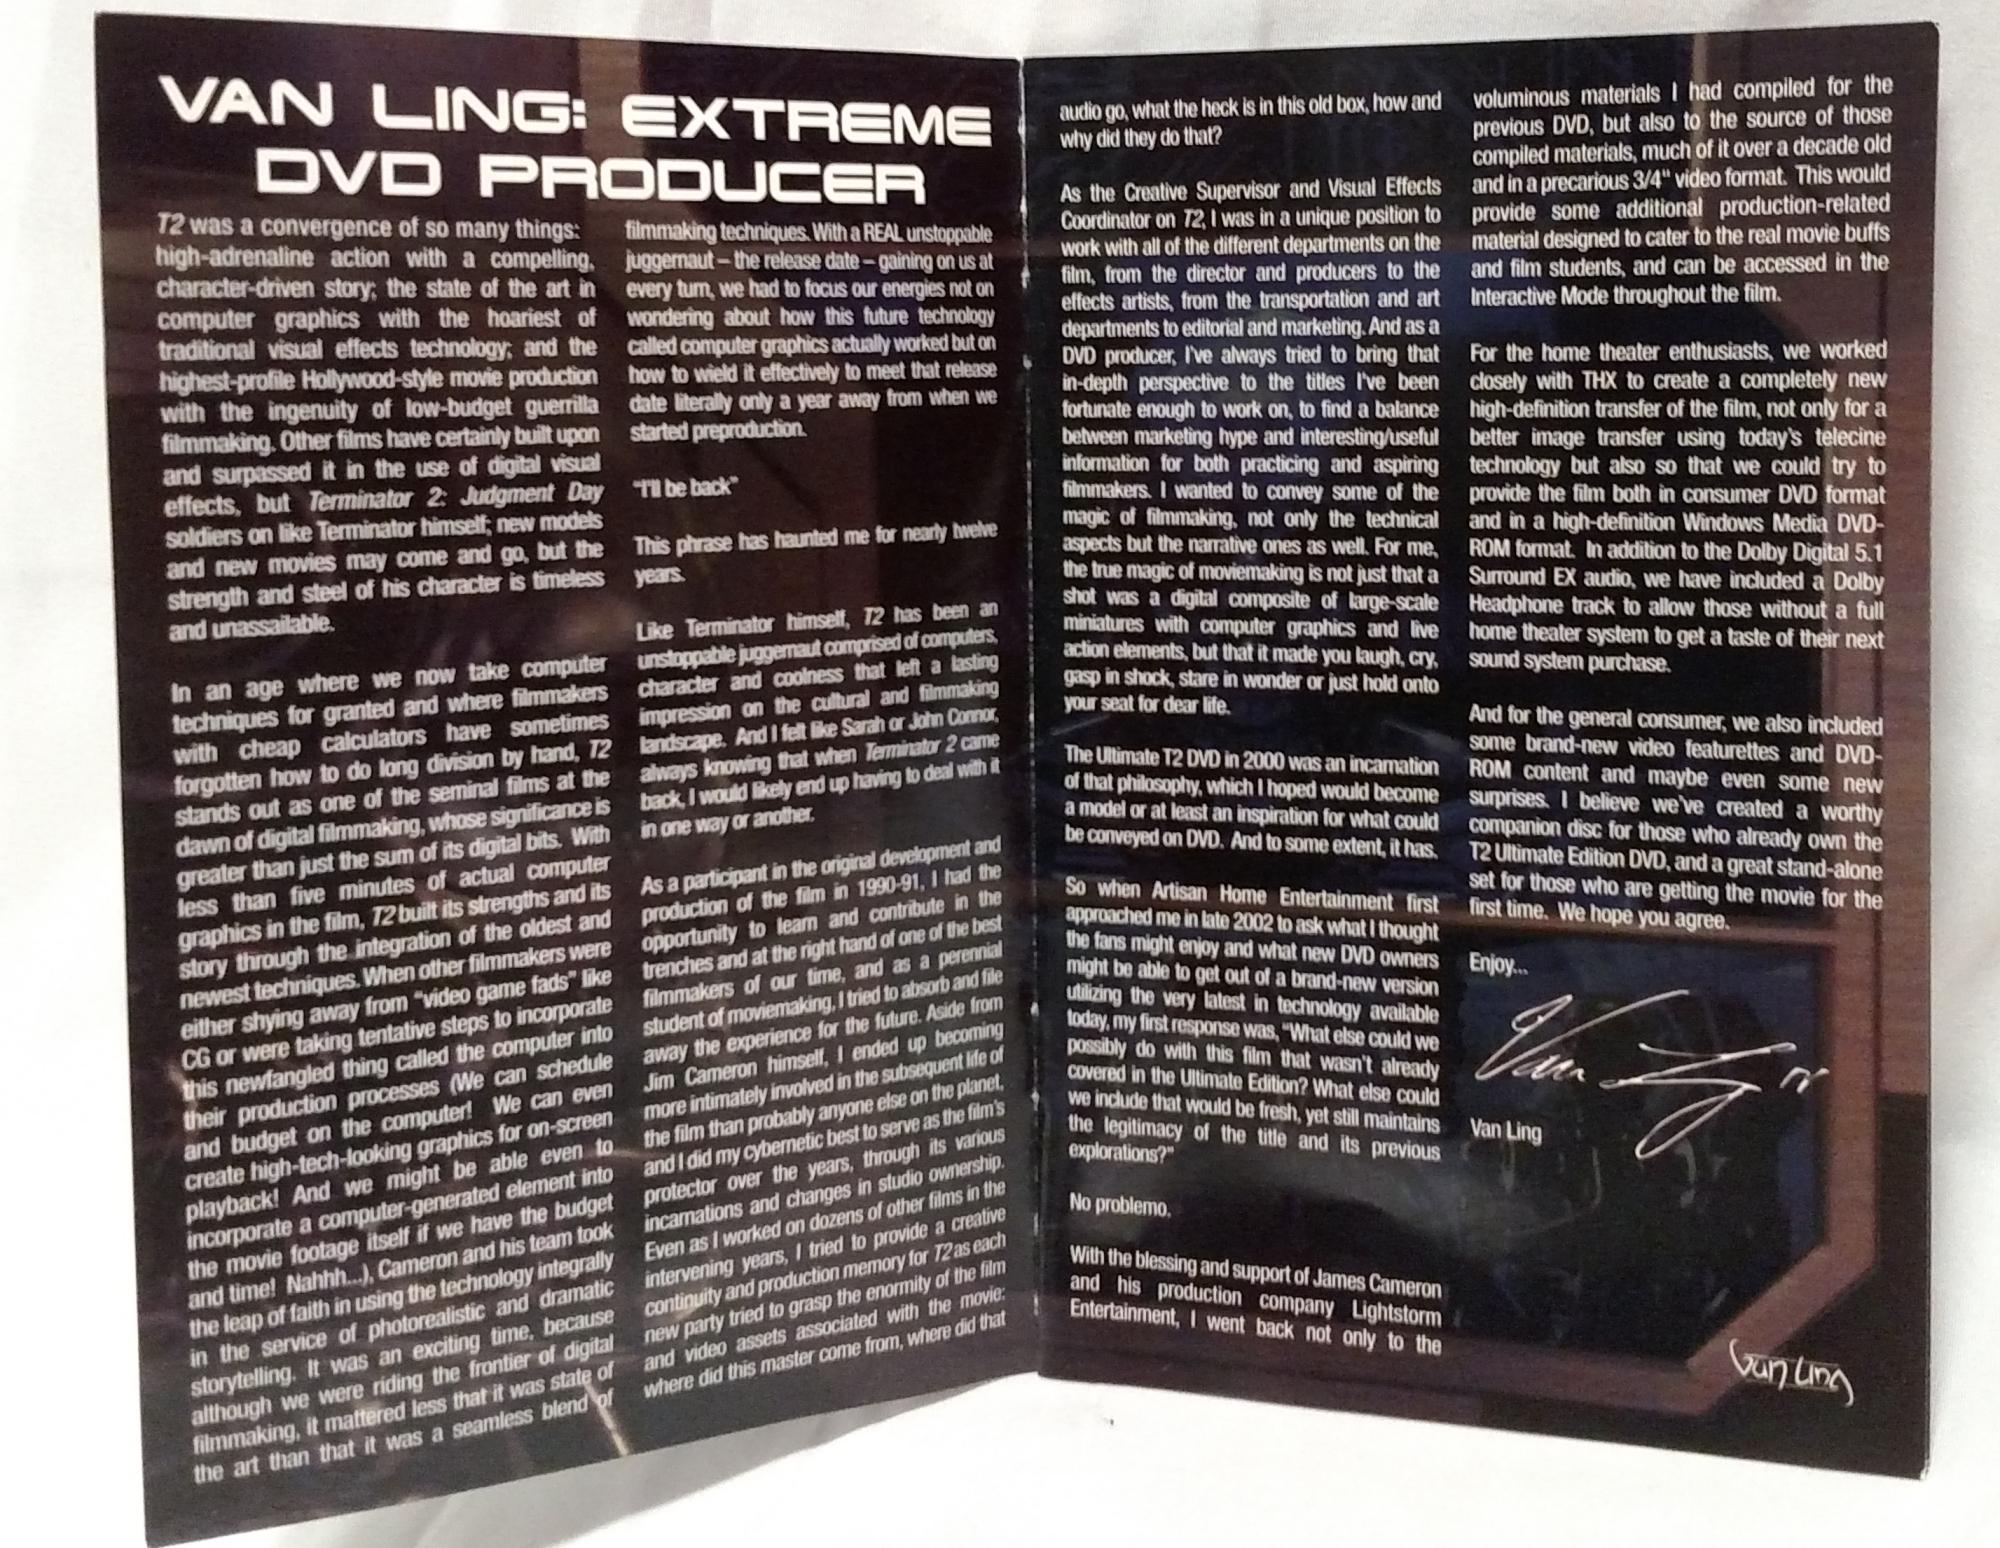 Terminator 2 Extreme DVD booklet